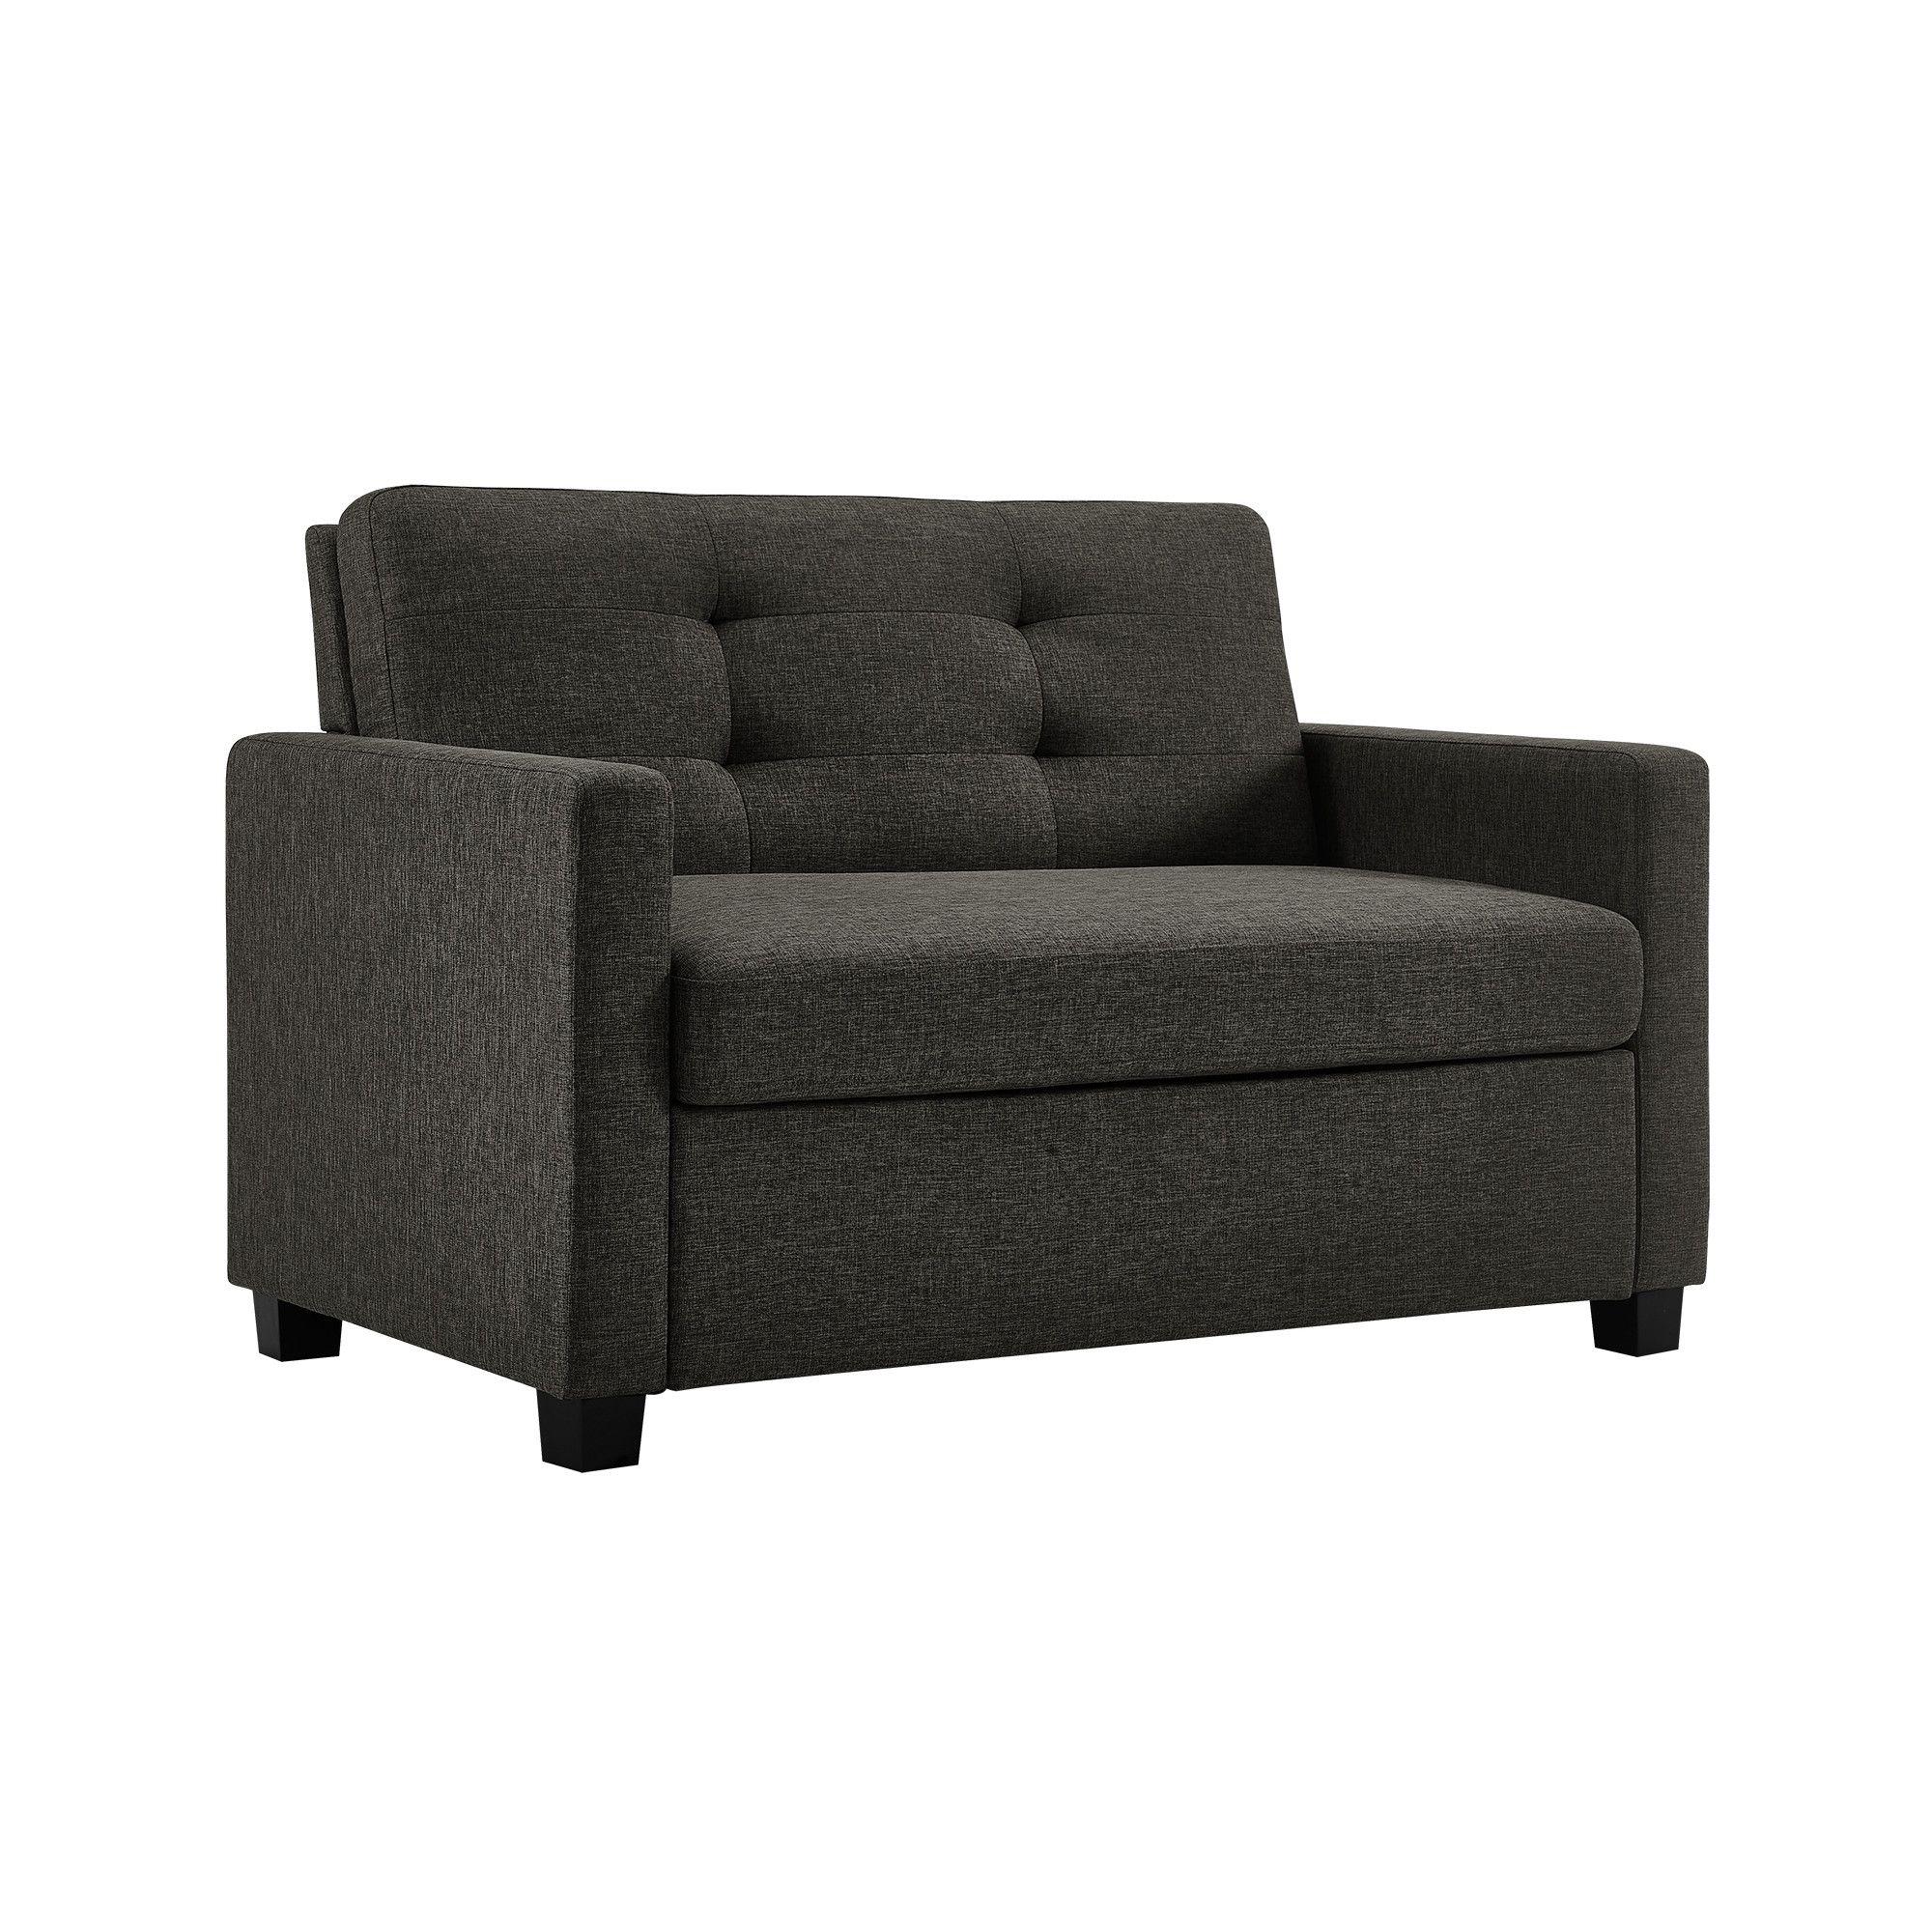 Fabulous Jovita Sleeper Sofa Bed Home Office Twin Sleeper Sofa Machost Co Dining Chair Design Ideas Machostcouk